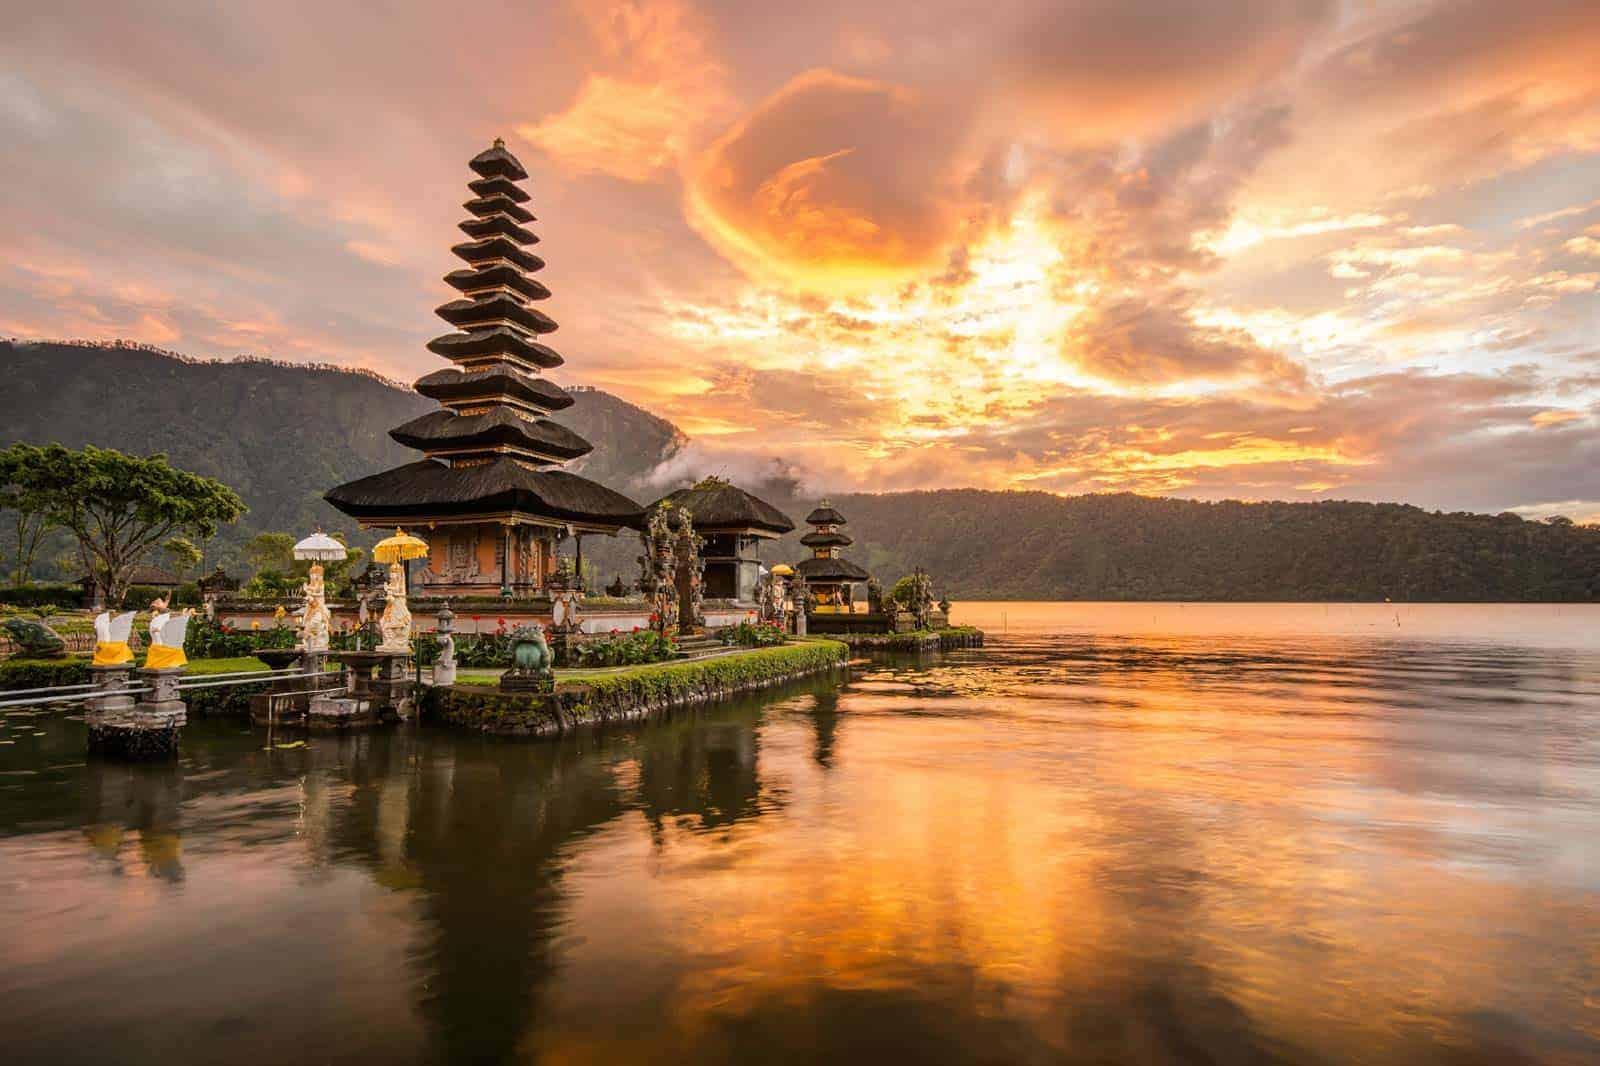 Temple í Bali, Indónesíu